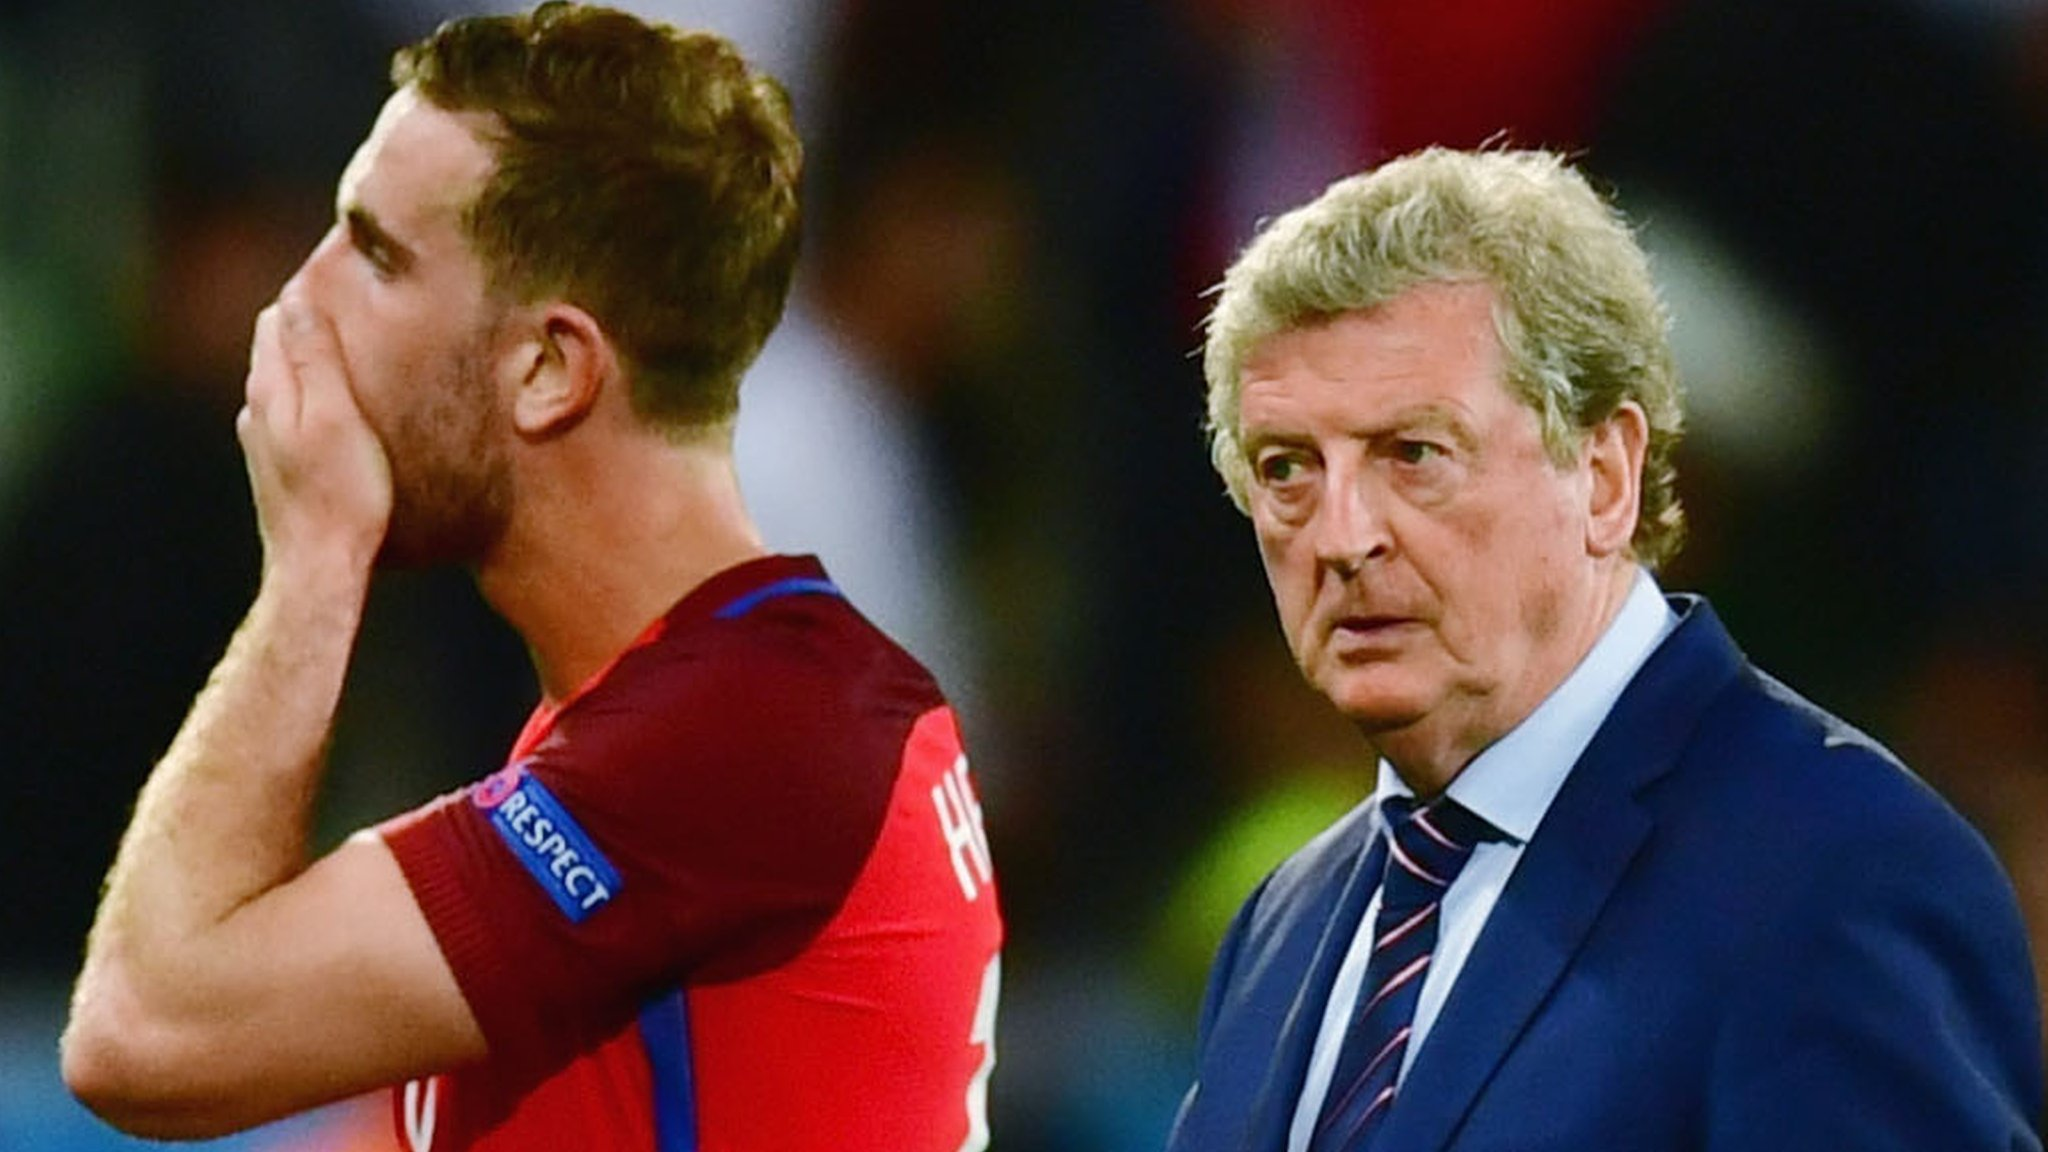 Usas scoreless draw vs serbia offers glimpse into arenas preferences foxsports com - Euro 2016 Wayne Rooney